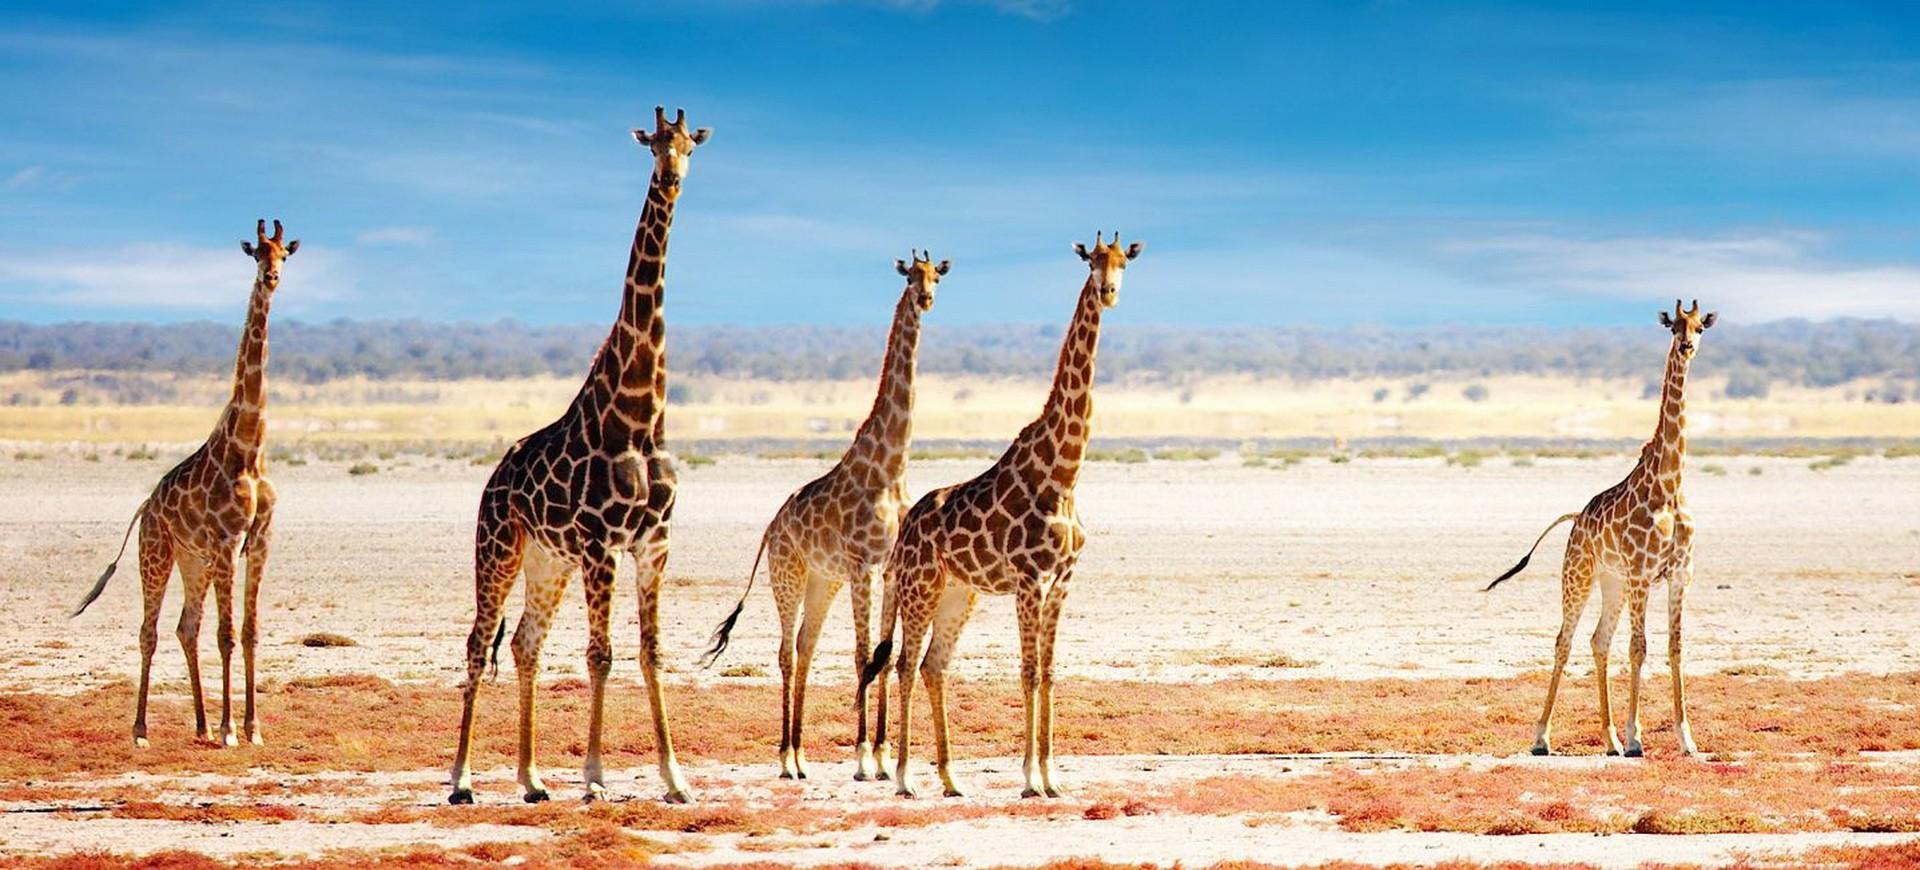 Estosha National Parc en Namibie